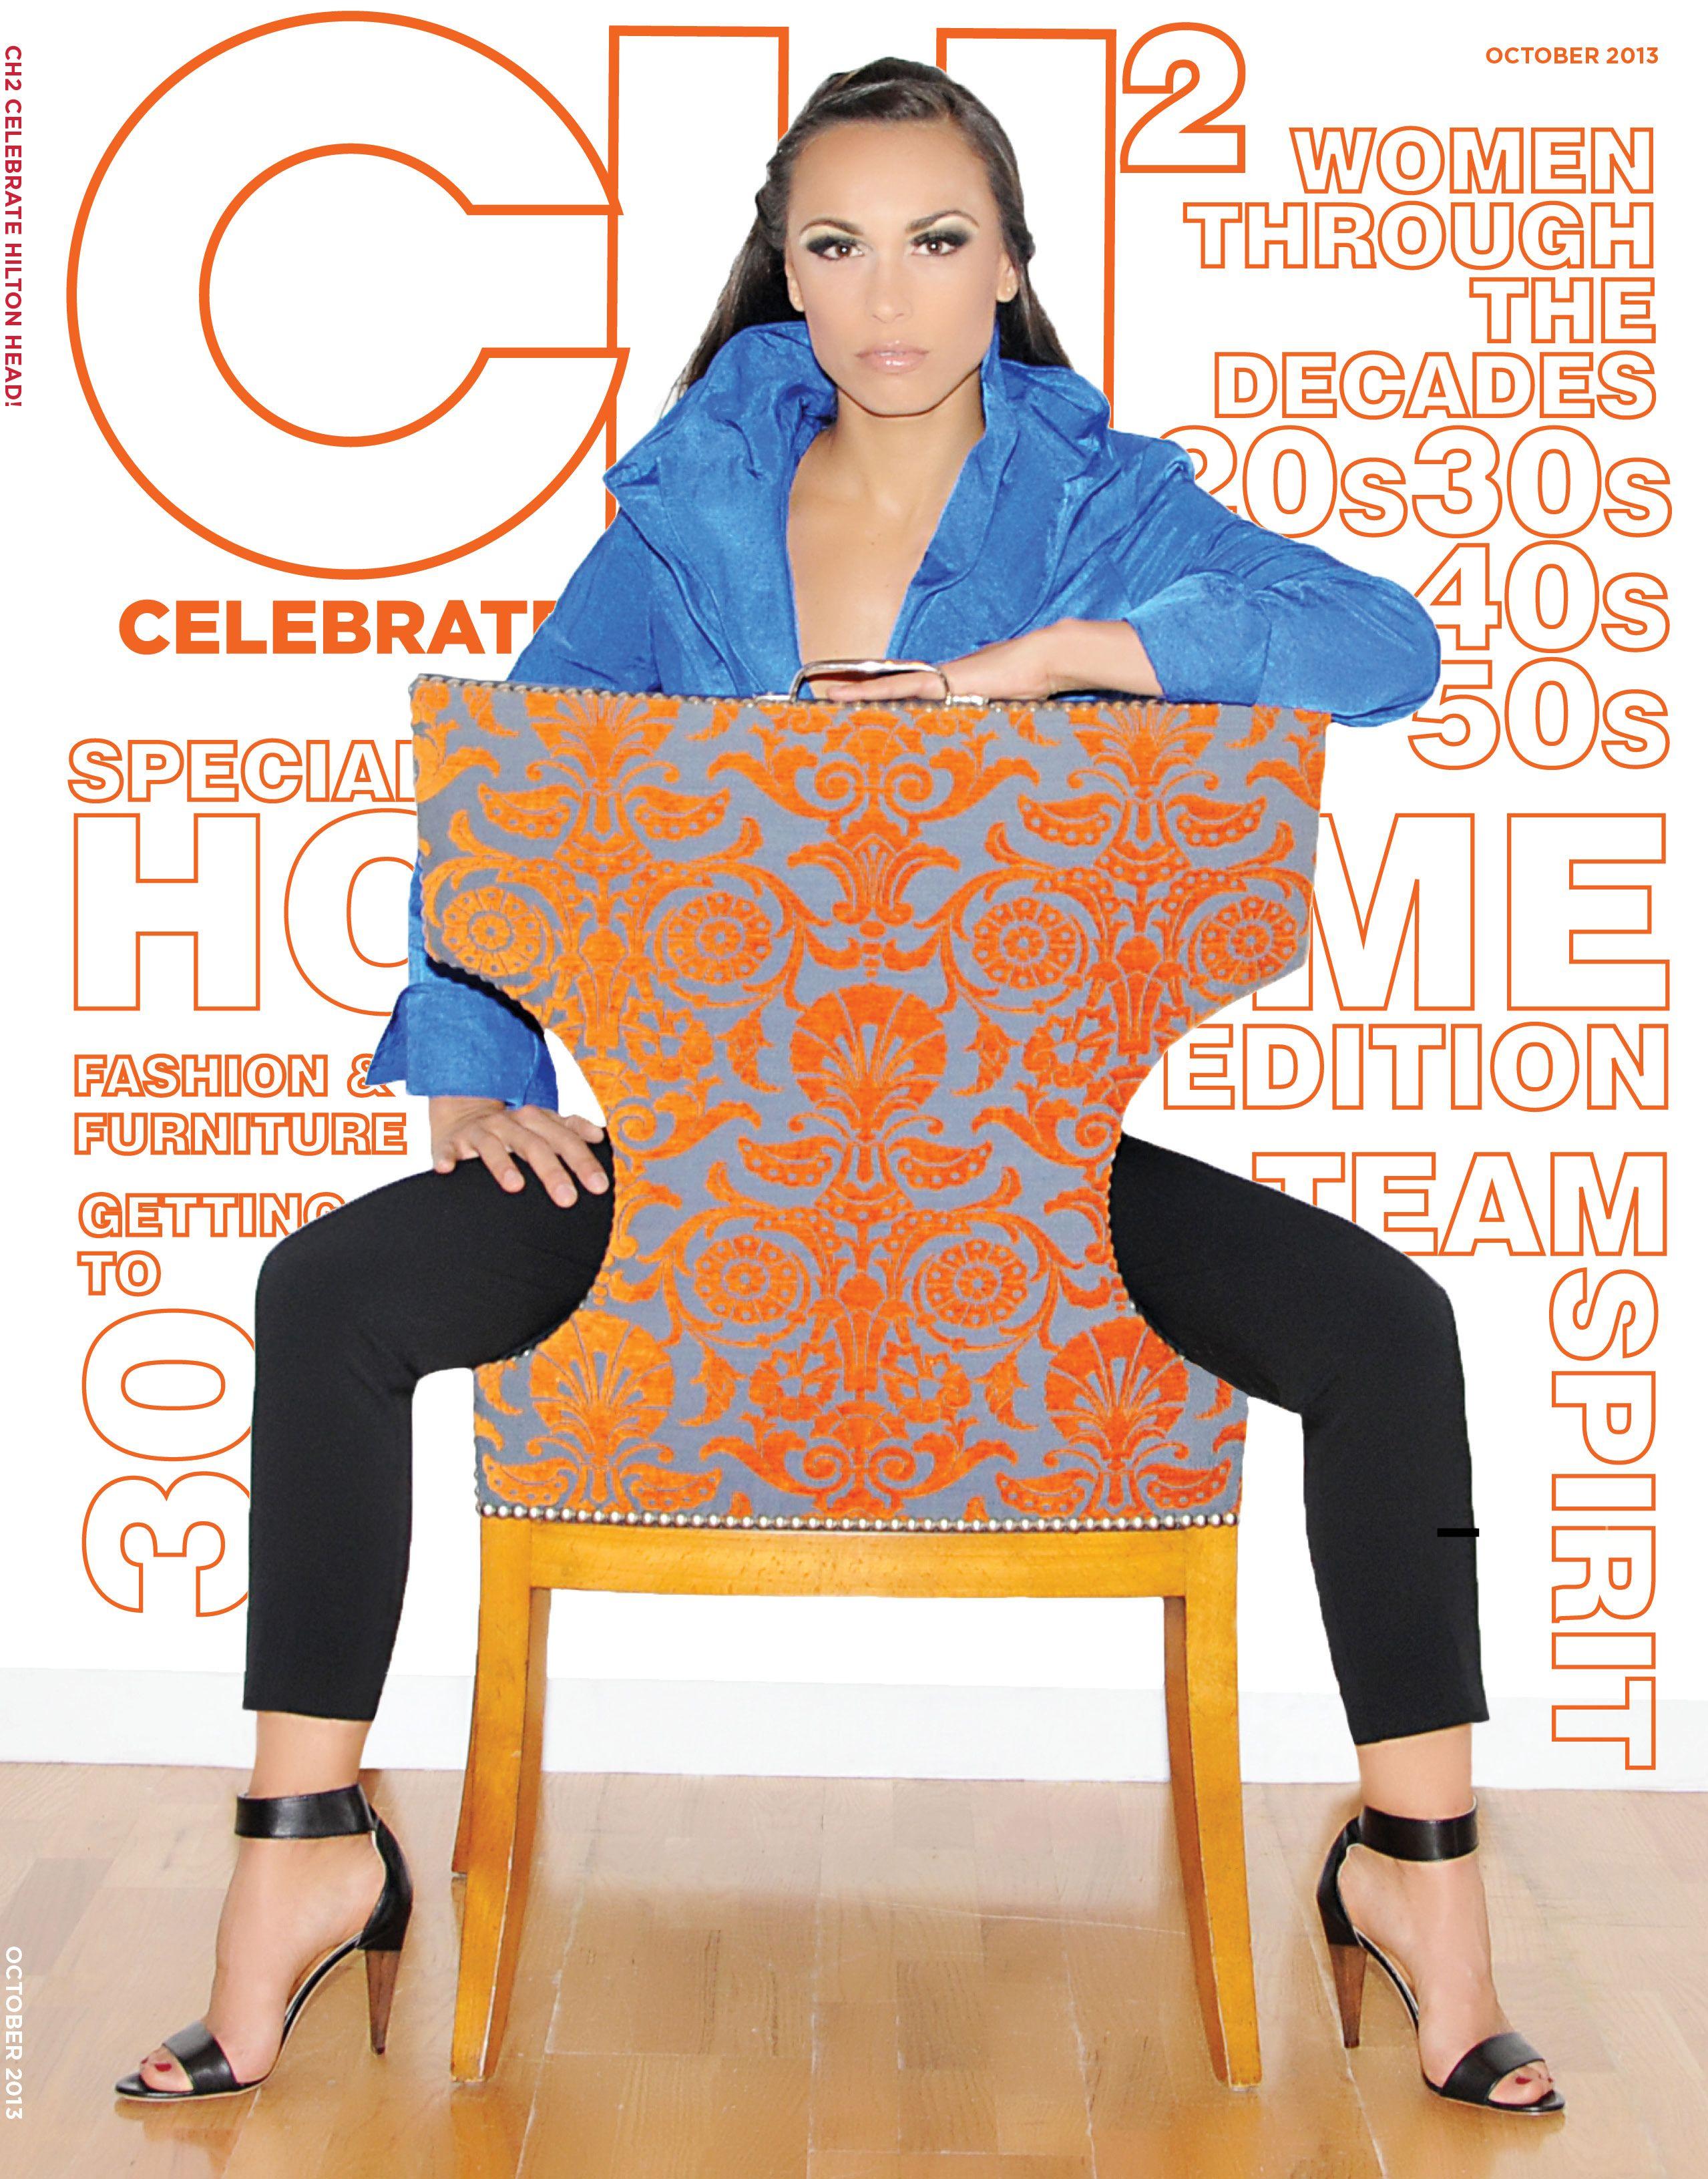 CH2 Magazine - October 2013